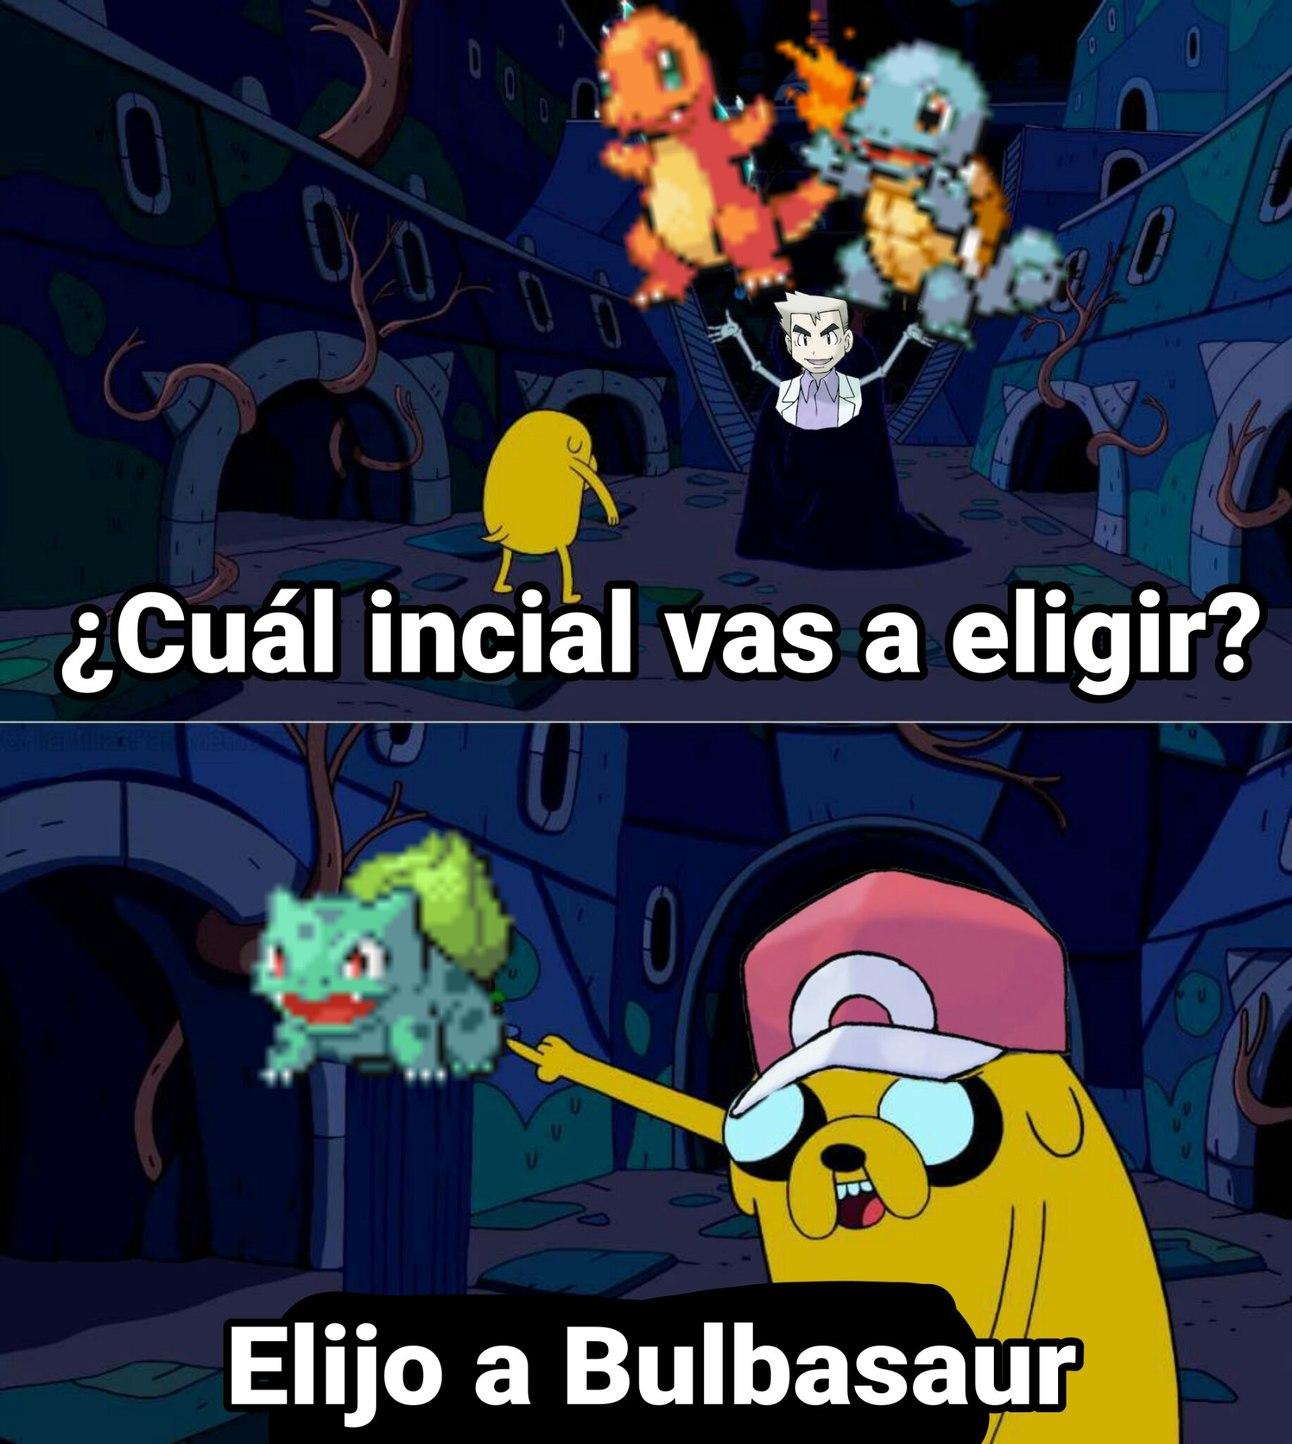 asies yo elijo bulbasaur - meme